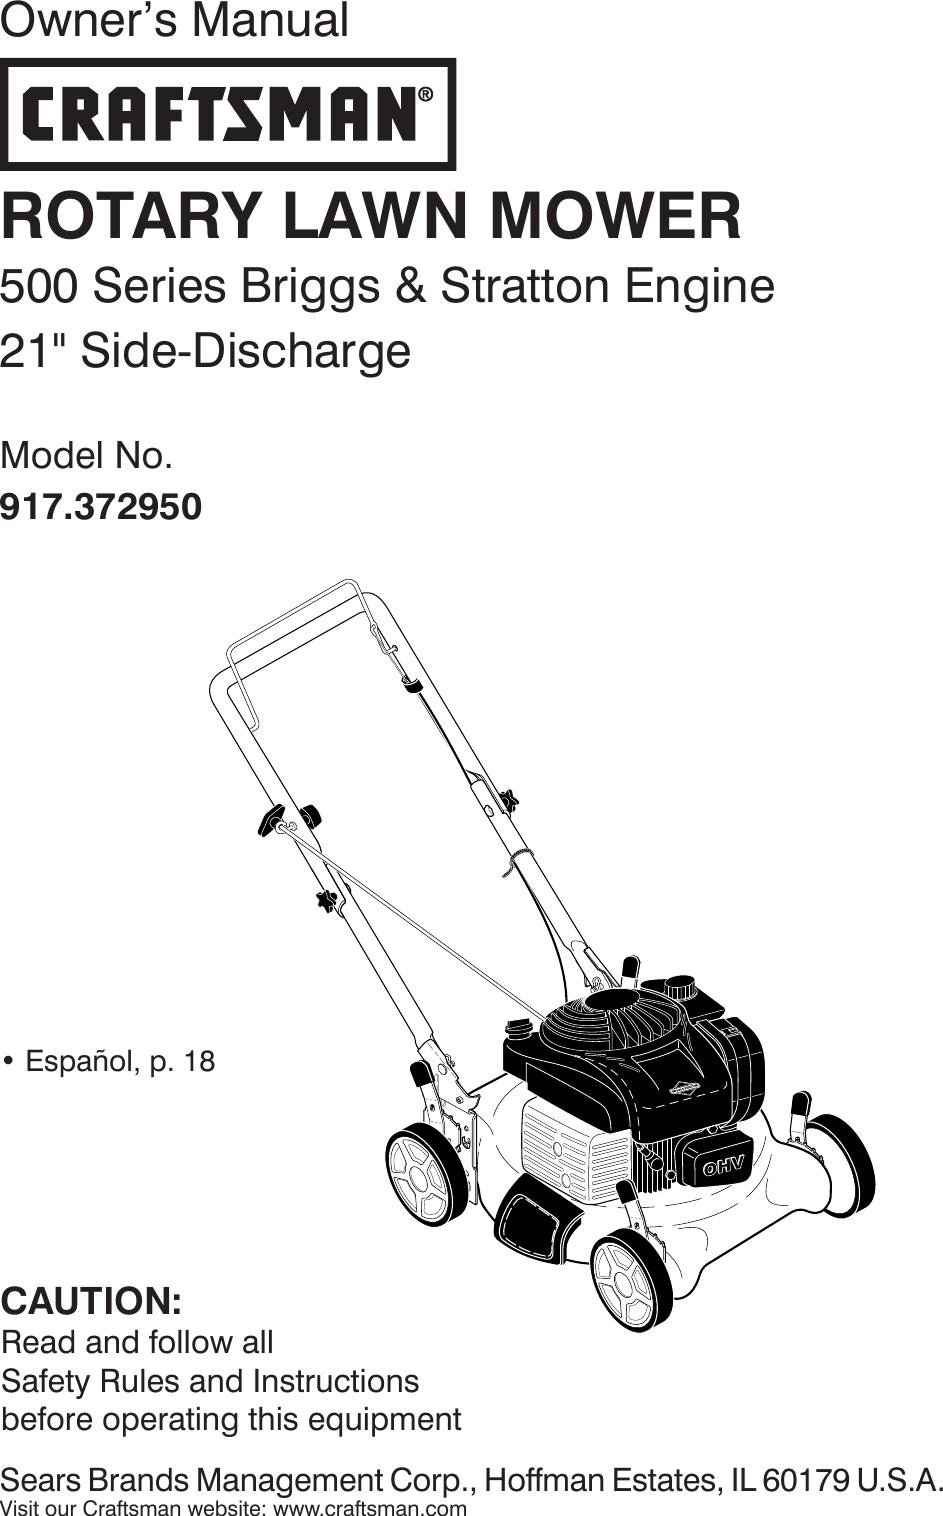 Craftsman 917372950 372950 es 590015501_r0 User Manual